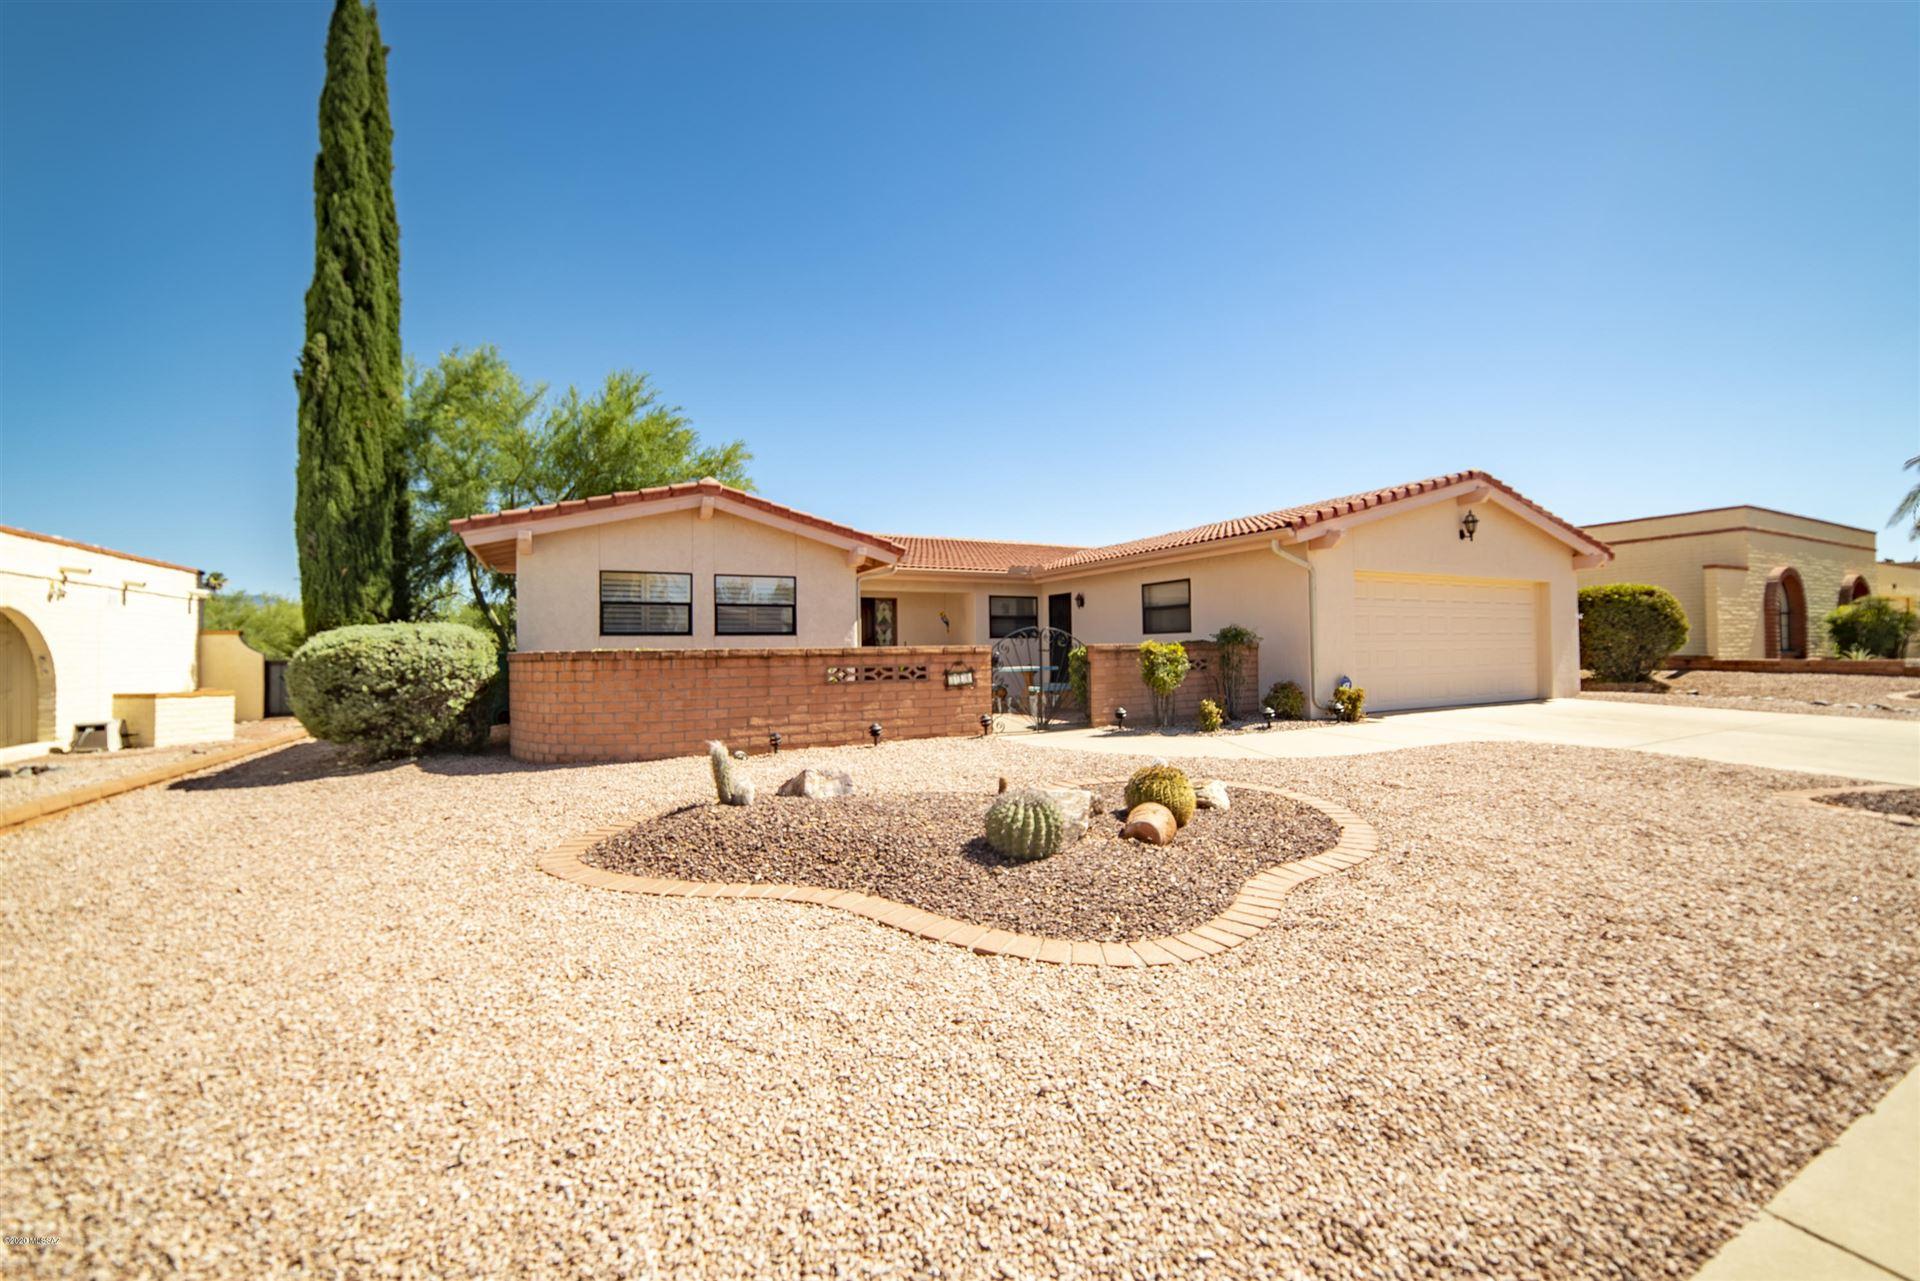 310 E Paseo Chuparosas, Green Valley, AZ 85614 - MLS#: 22014845